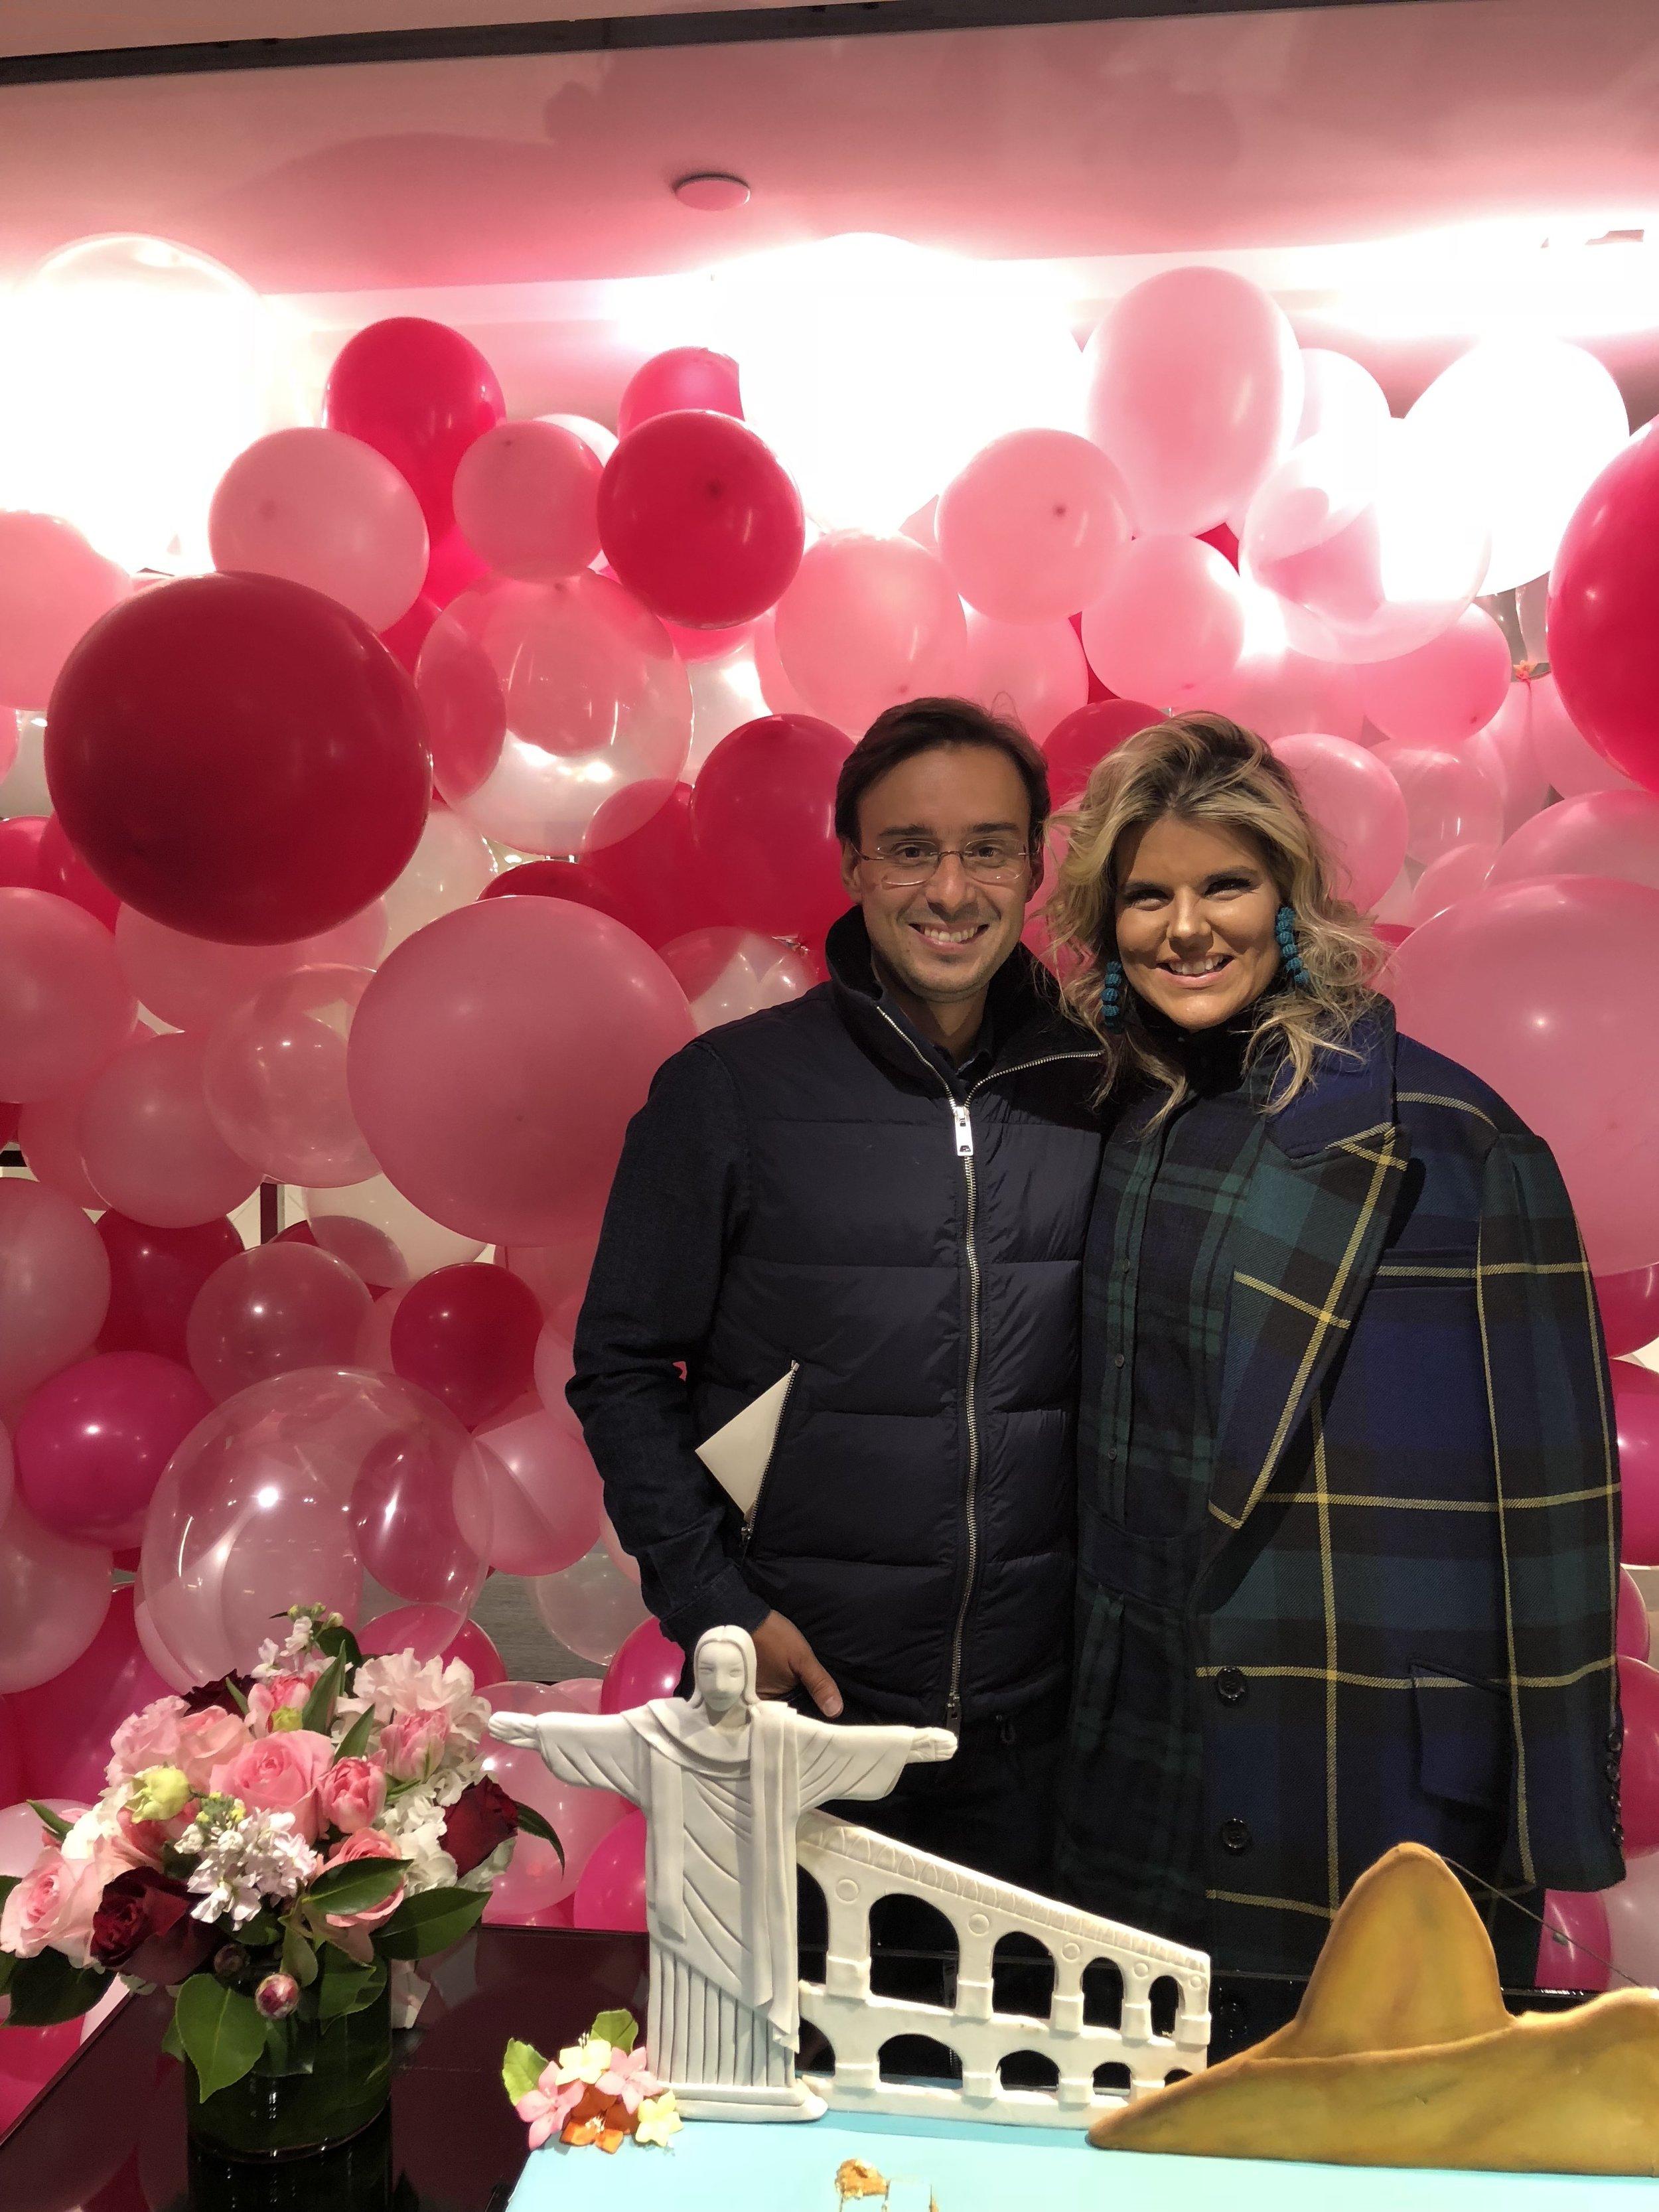 Nana Cunha and her husband, Lucas Lira, at Burberry Flagship New York